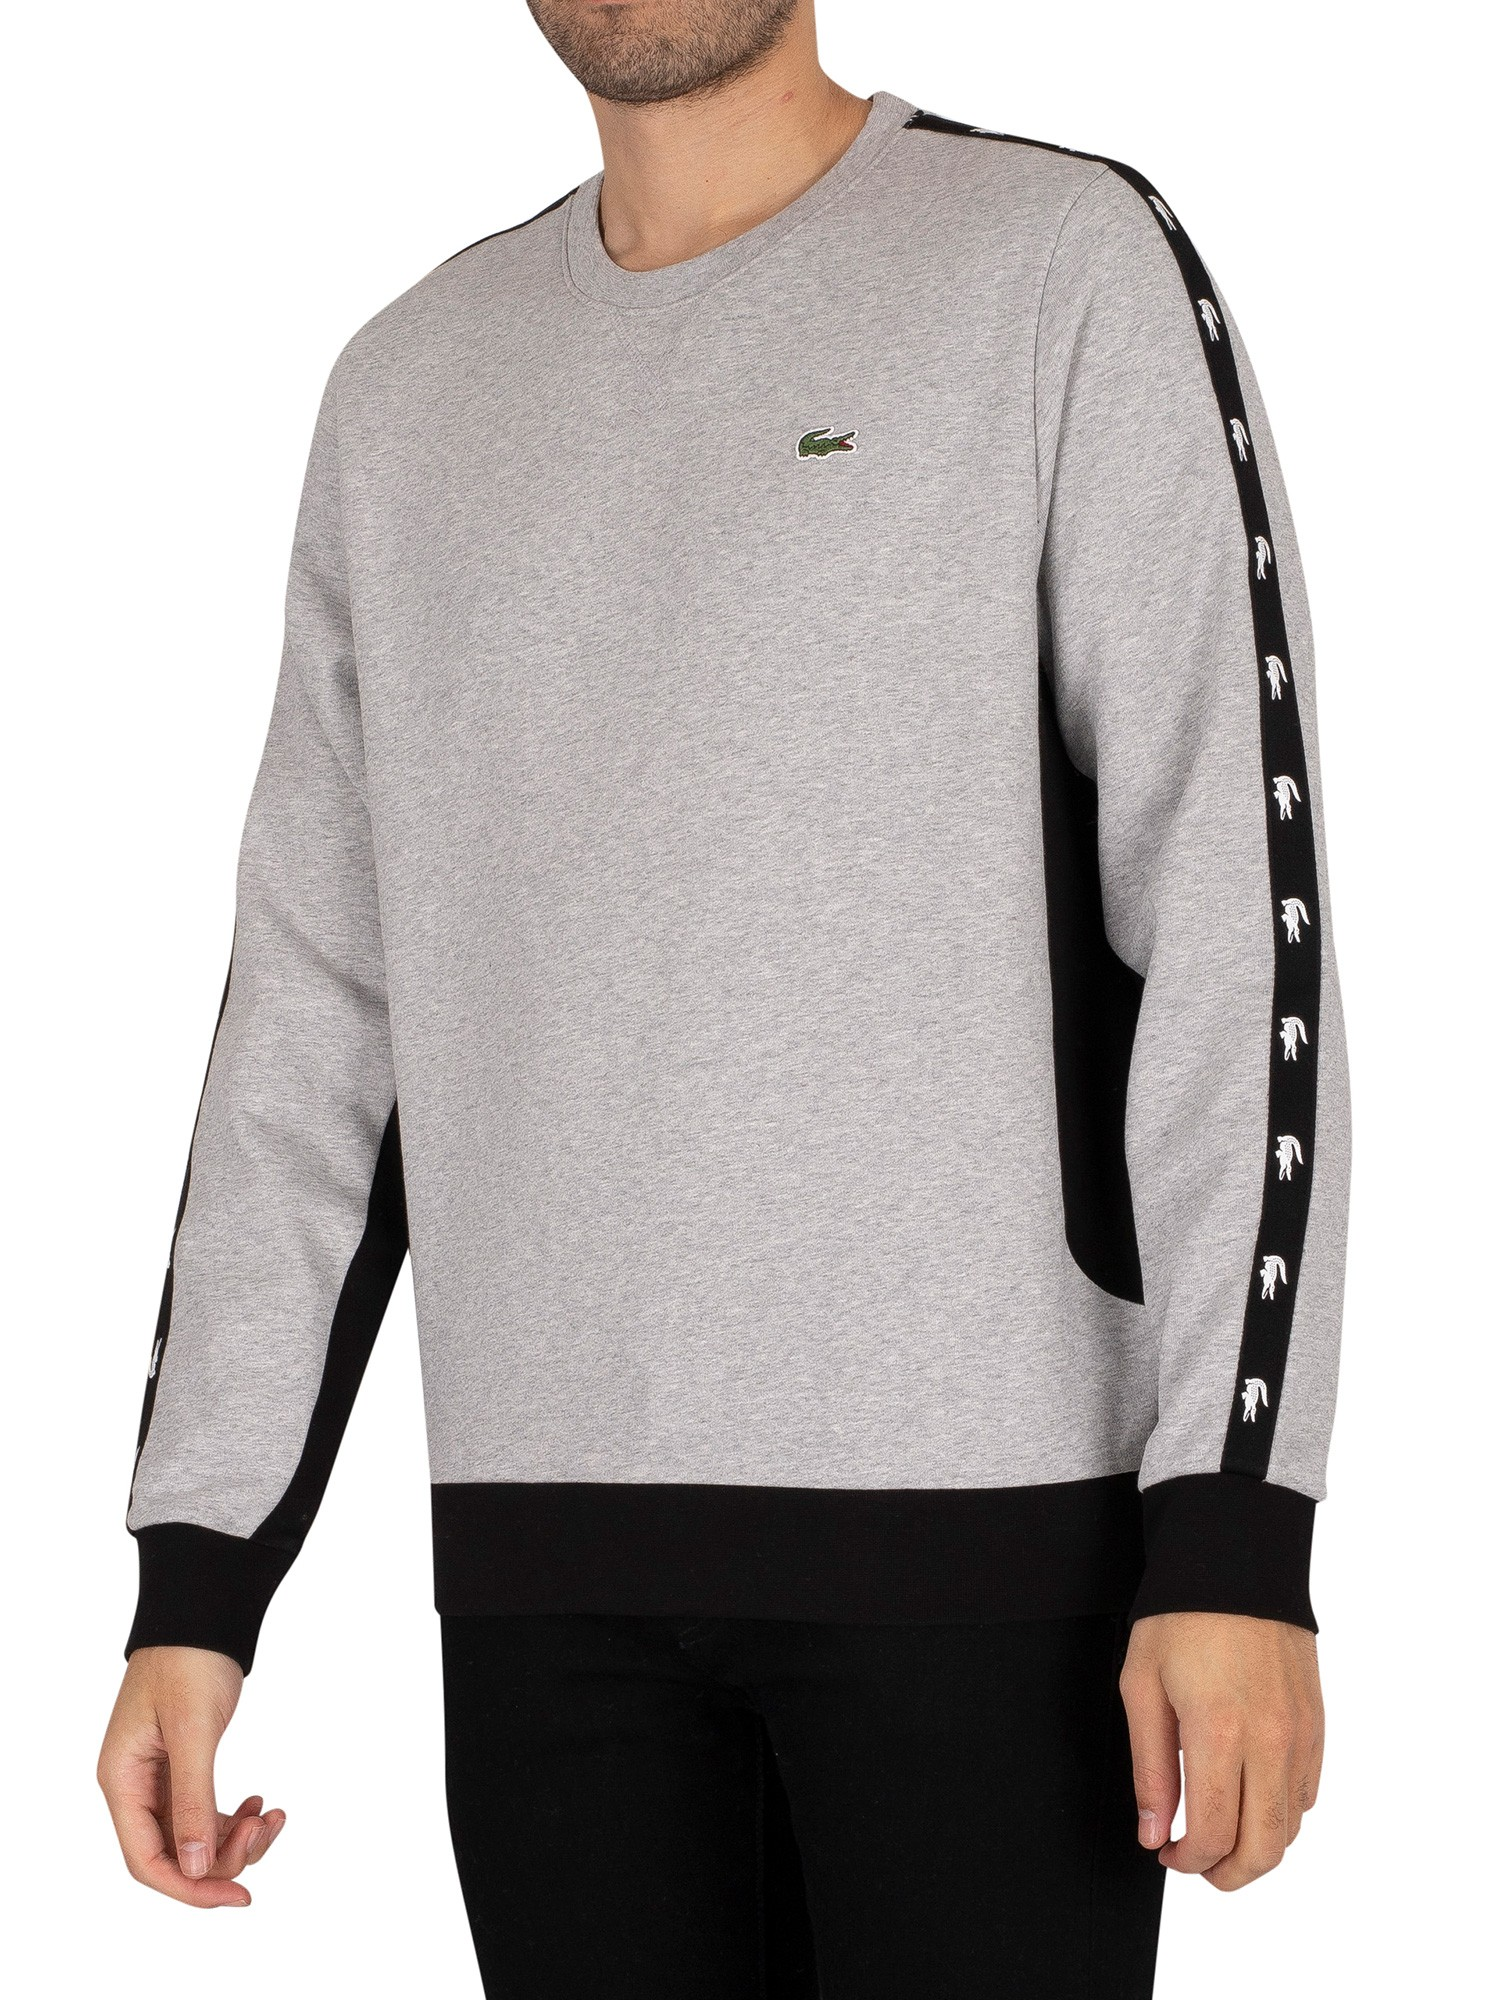 Colourblock Fleece Sweatshirt